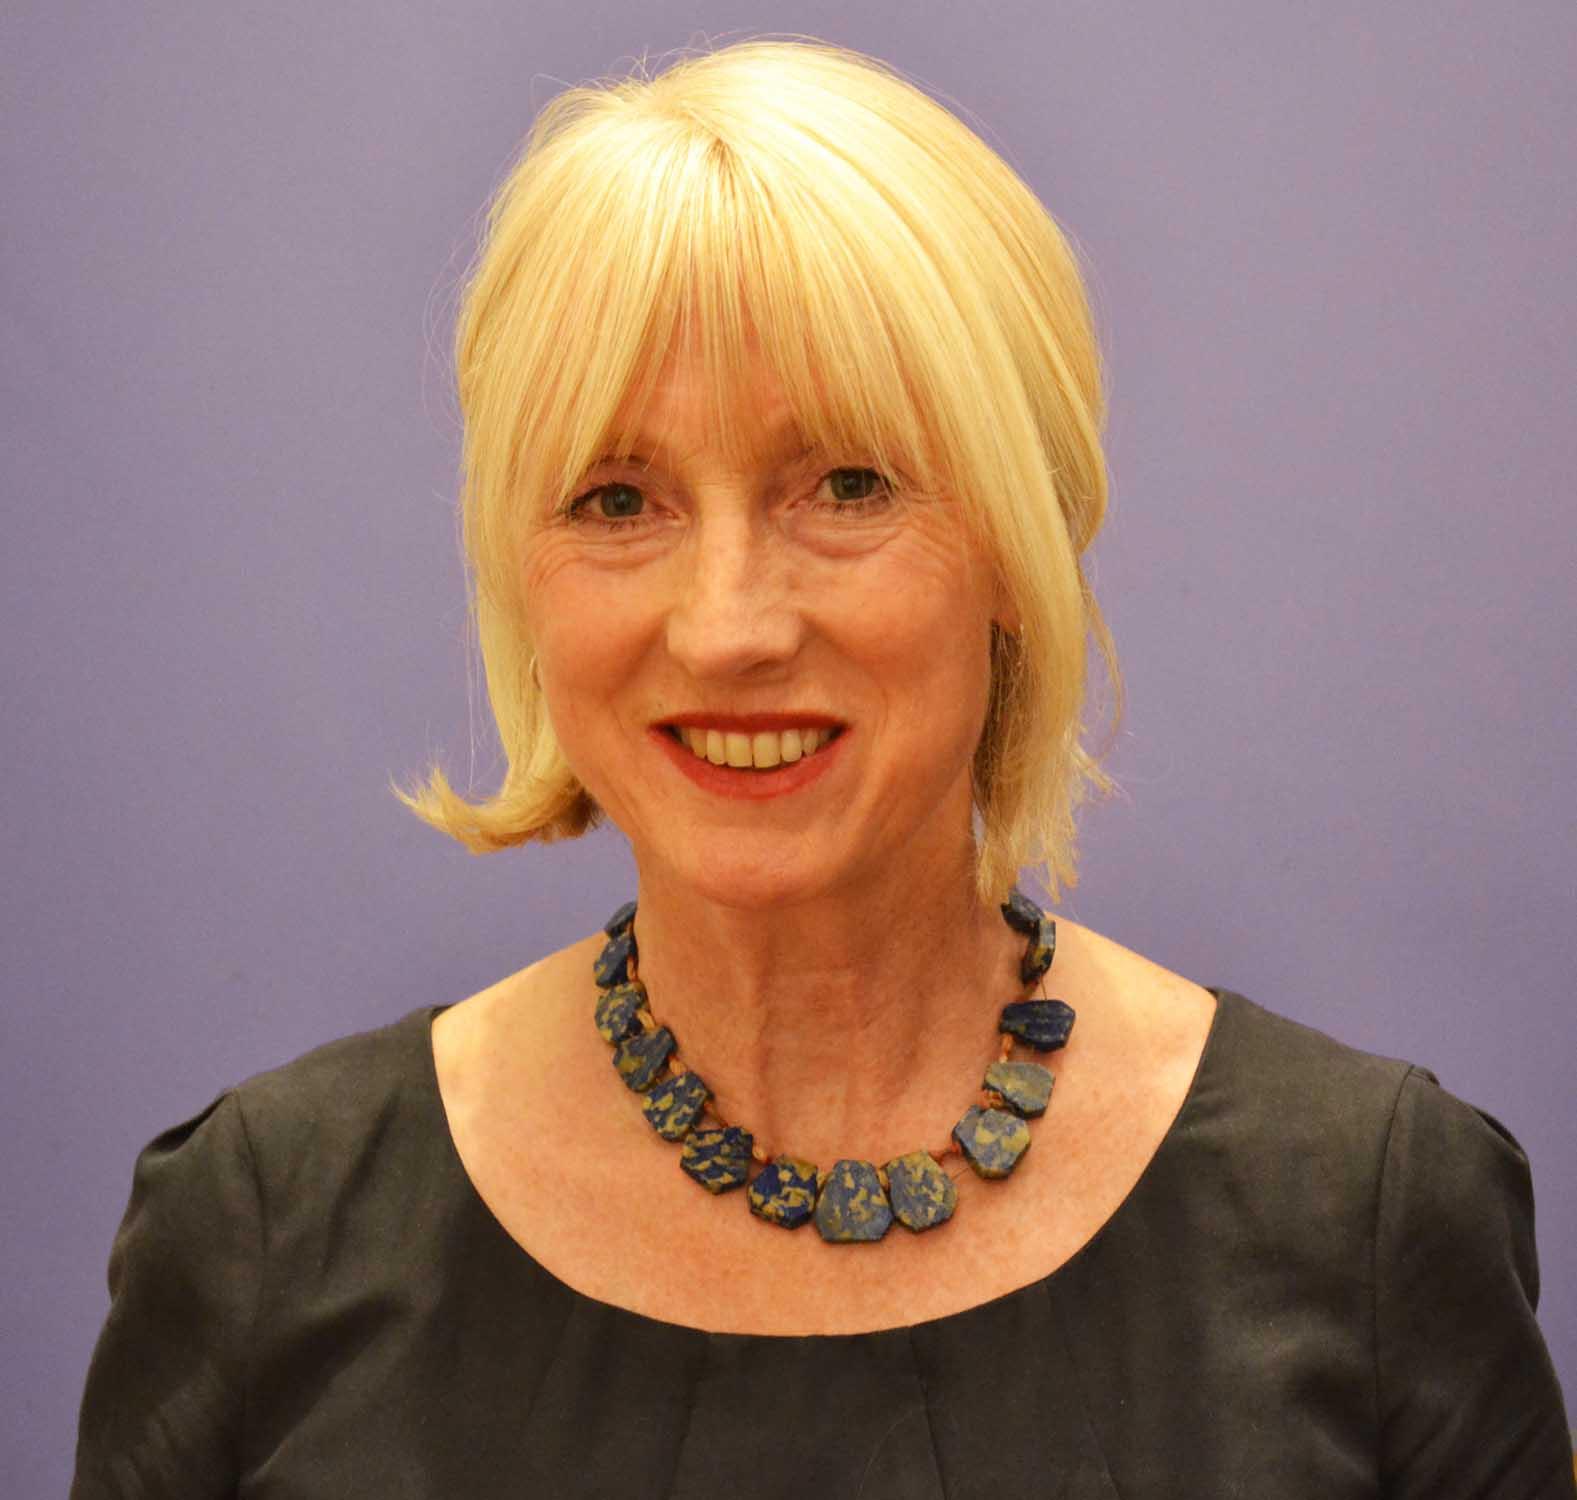 Susannah Buxton Net Worth